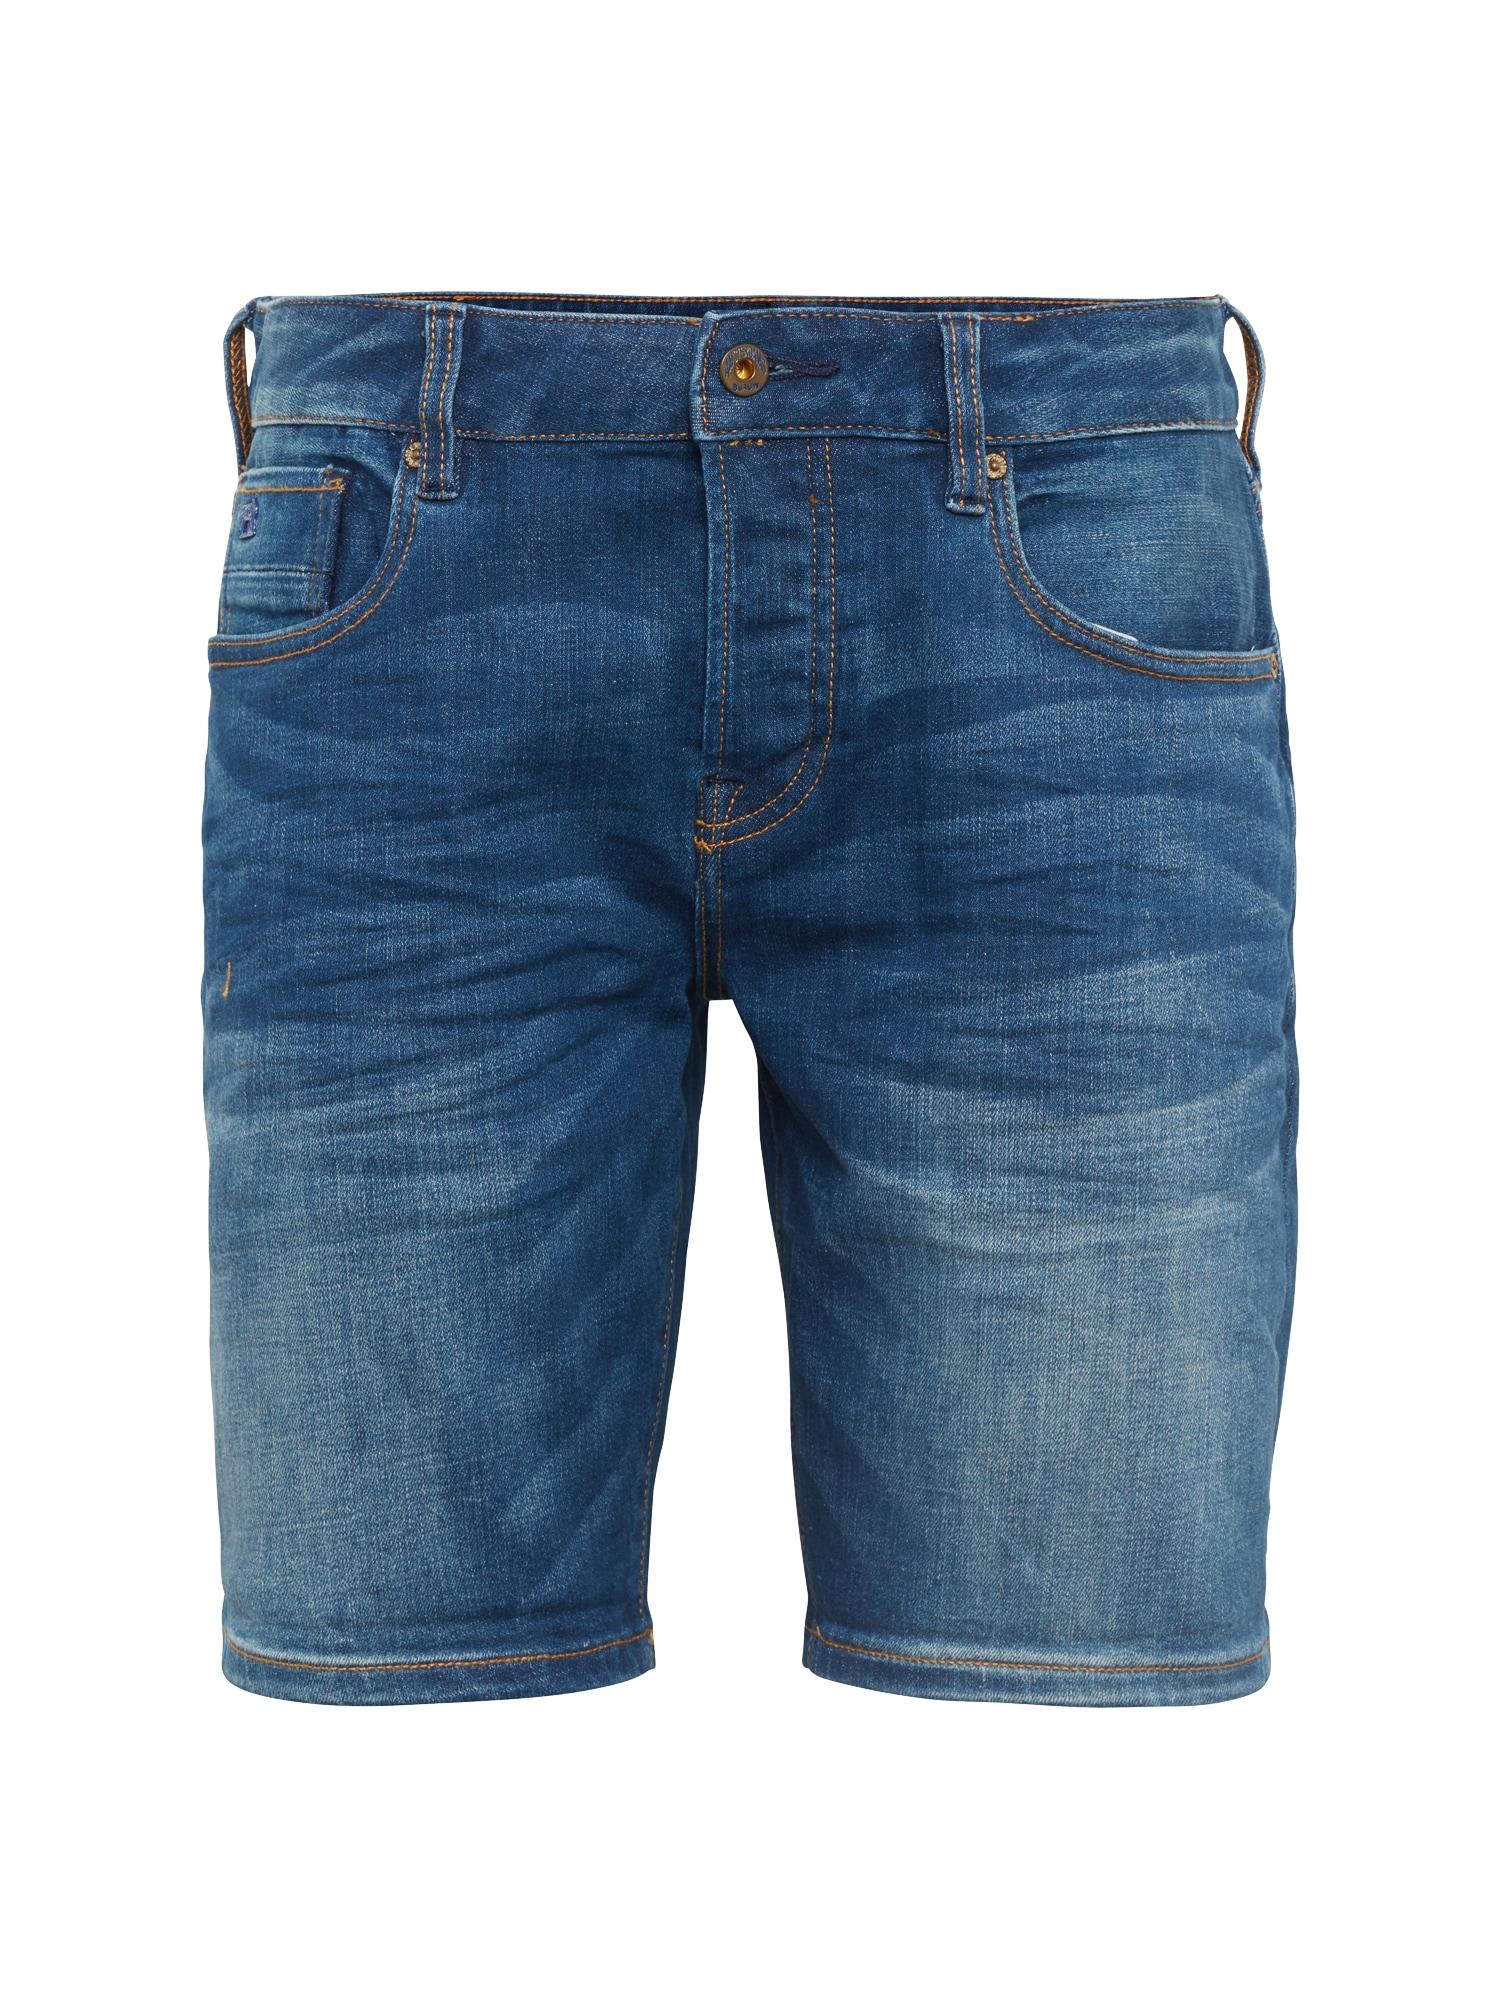 SCOTCH  and  SODA Heren Jeans Ralston Shorts Kimono Yes blauw denim